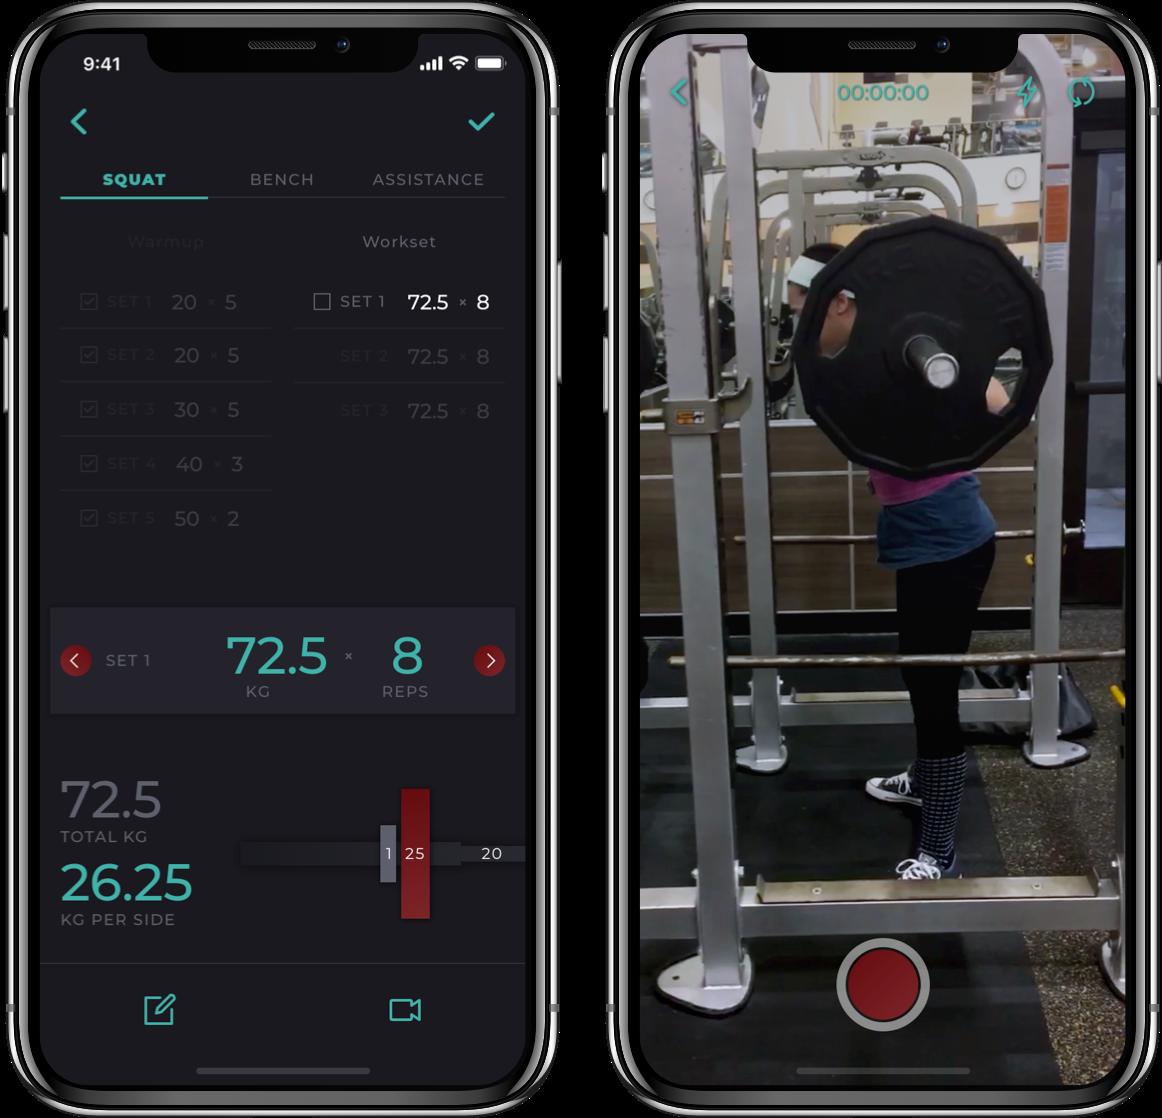 Barbellona mobile app training screens